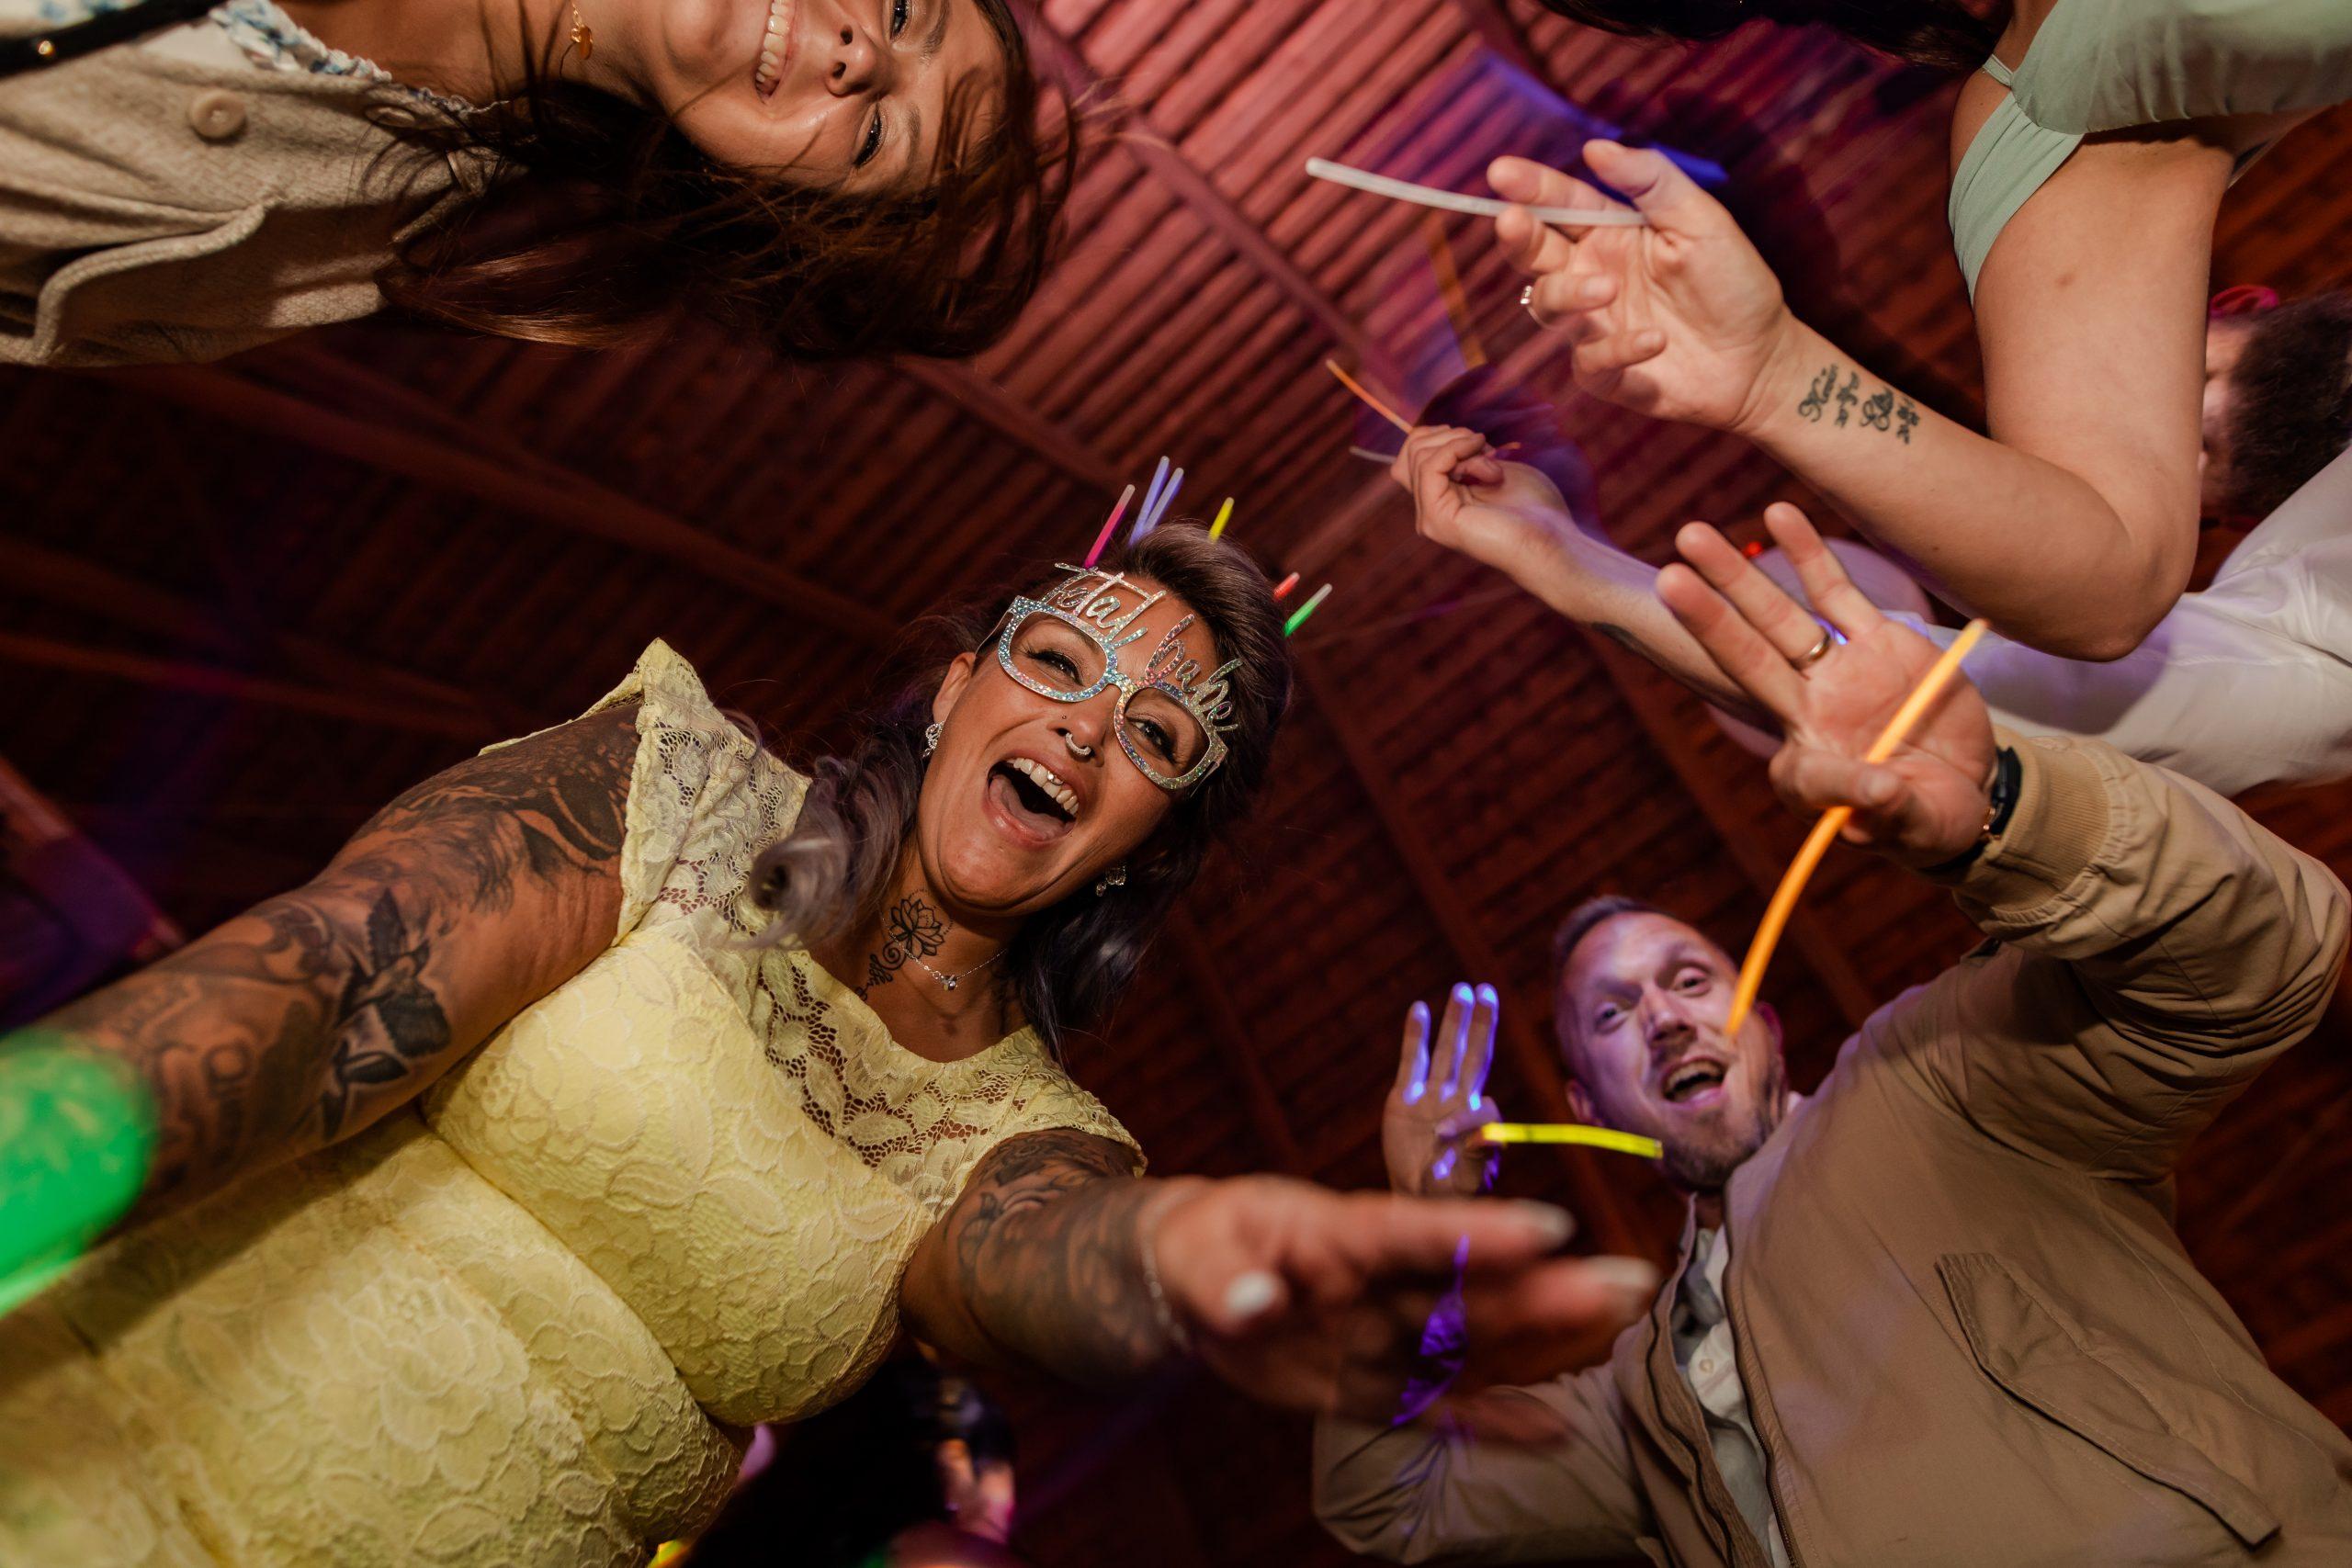 Bröllopsfest i Blankefall loge